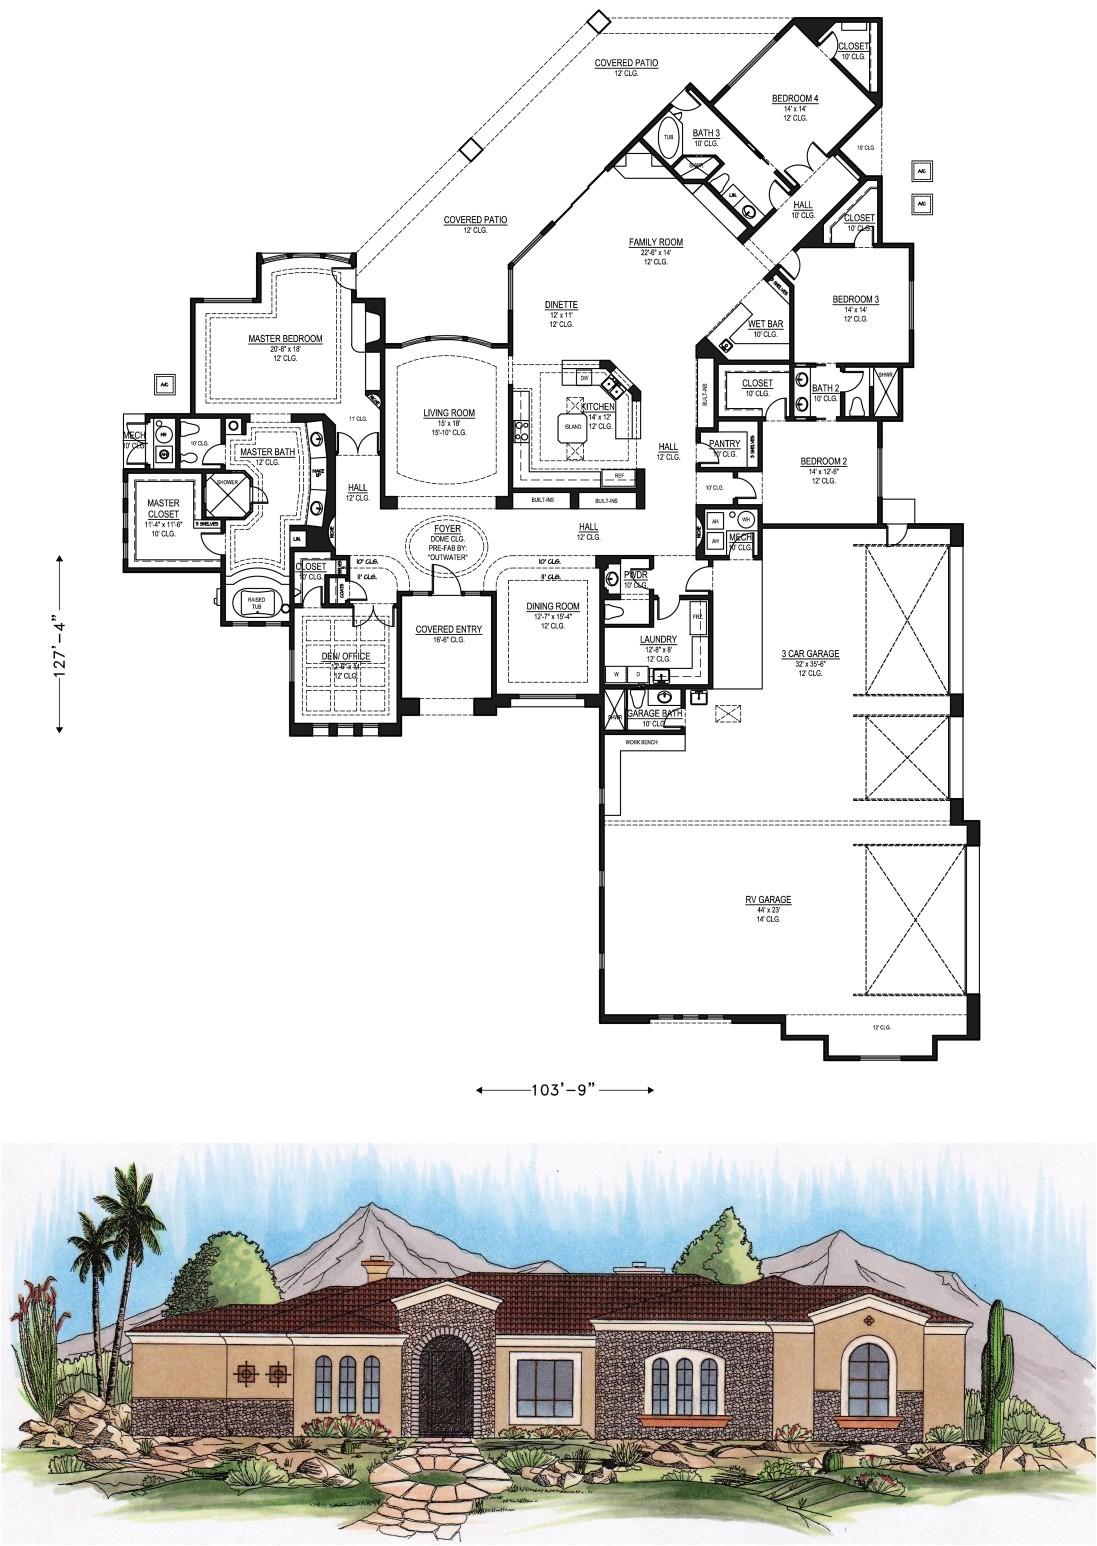 scottsdalehouseplans com 5e4500to6000